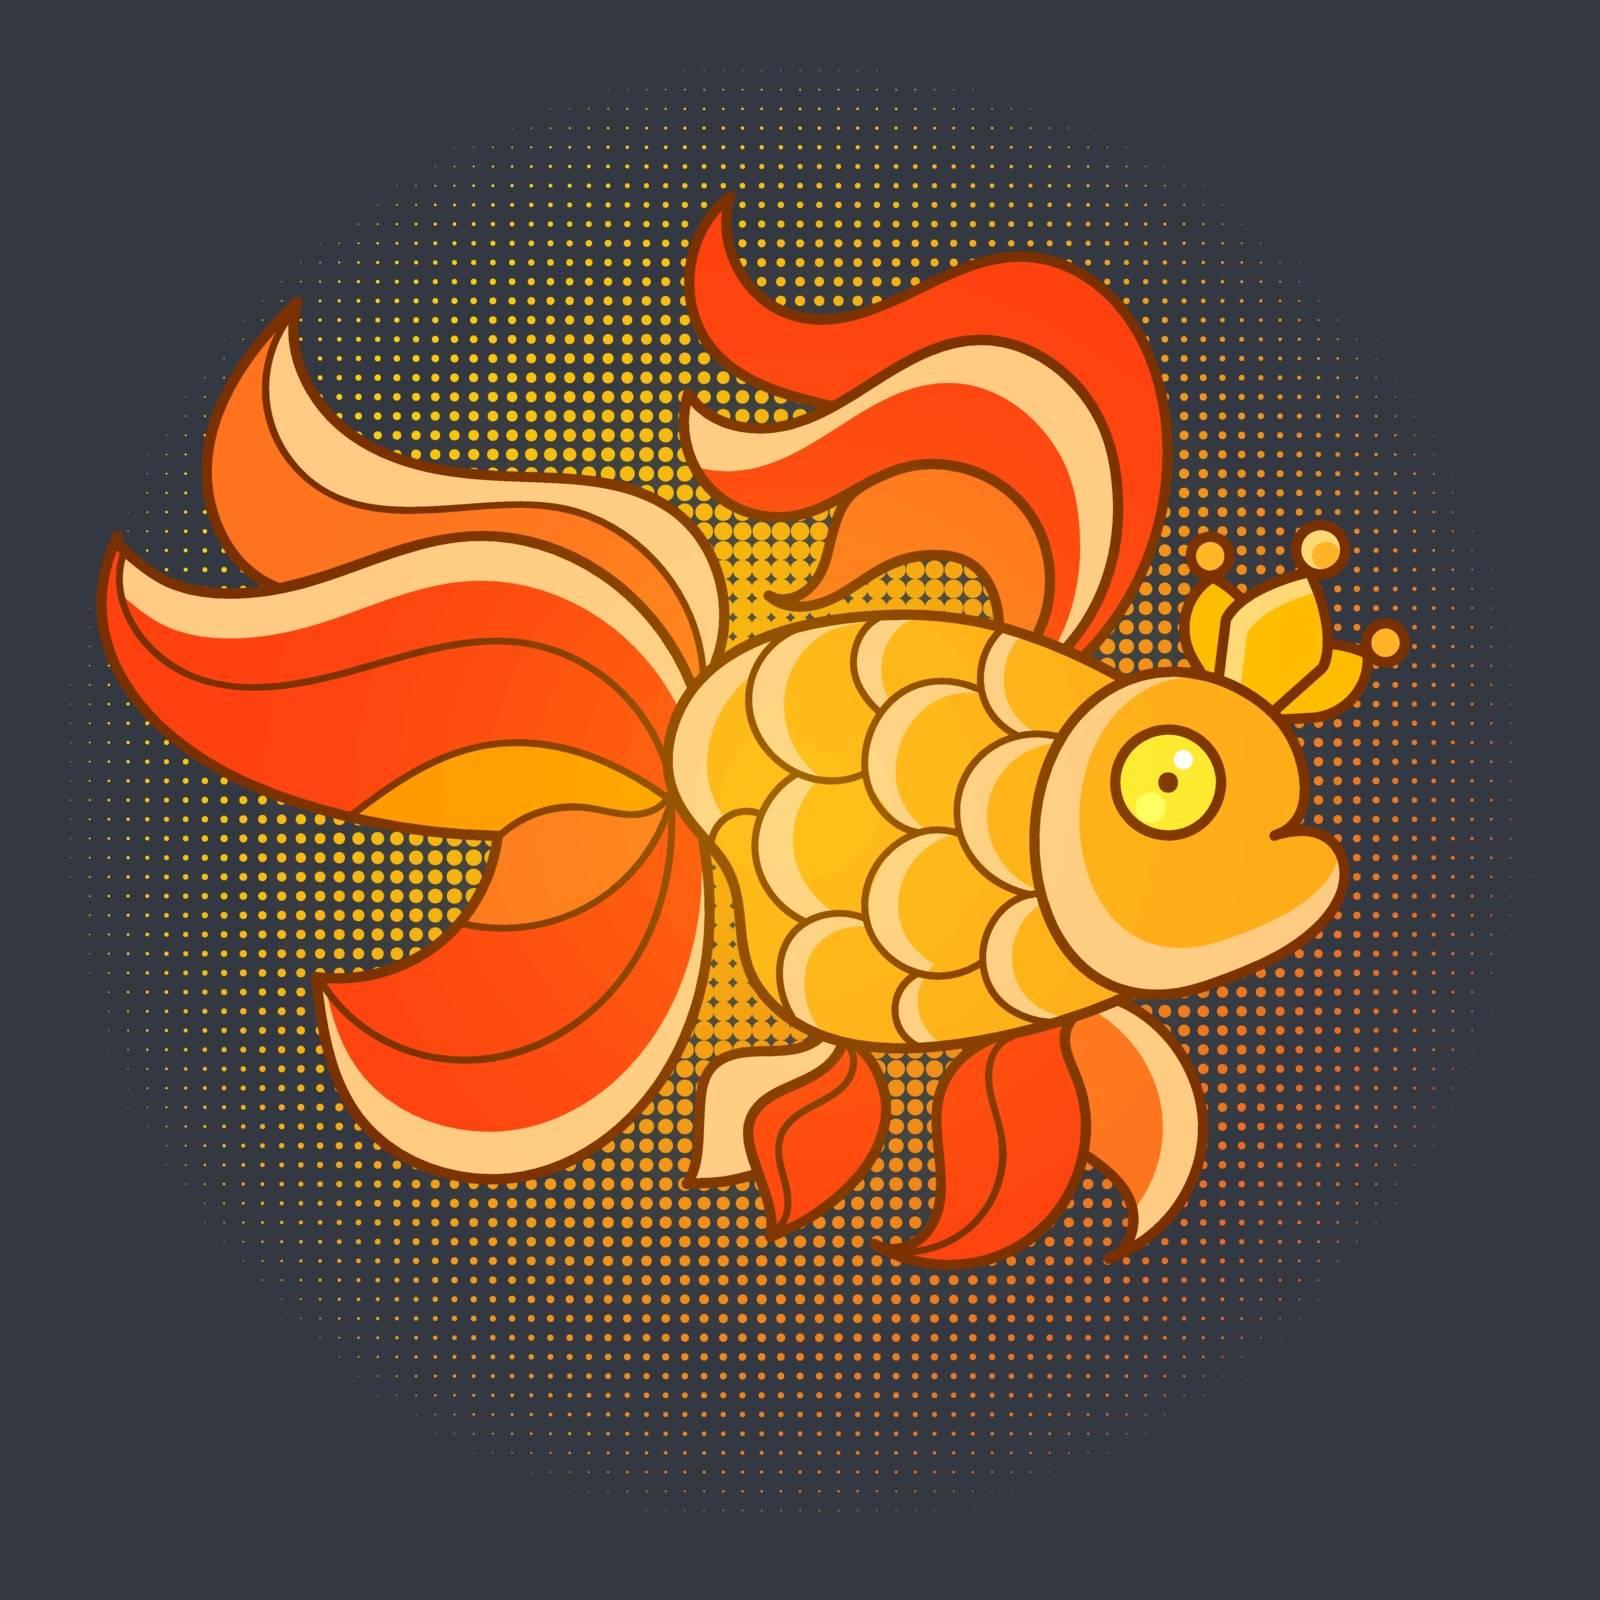 Goldfish, Realistic Illustration Vector Icon. Silhouette Sticker, Patch Badge. Cute Magic Cartoon Fantasy Cute Animal. Symbol Of Sleep. Design For Children